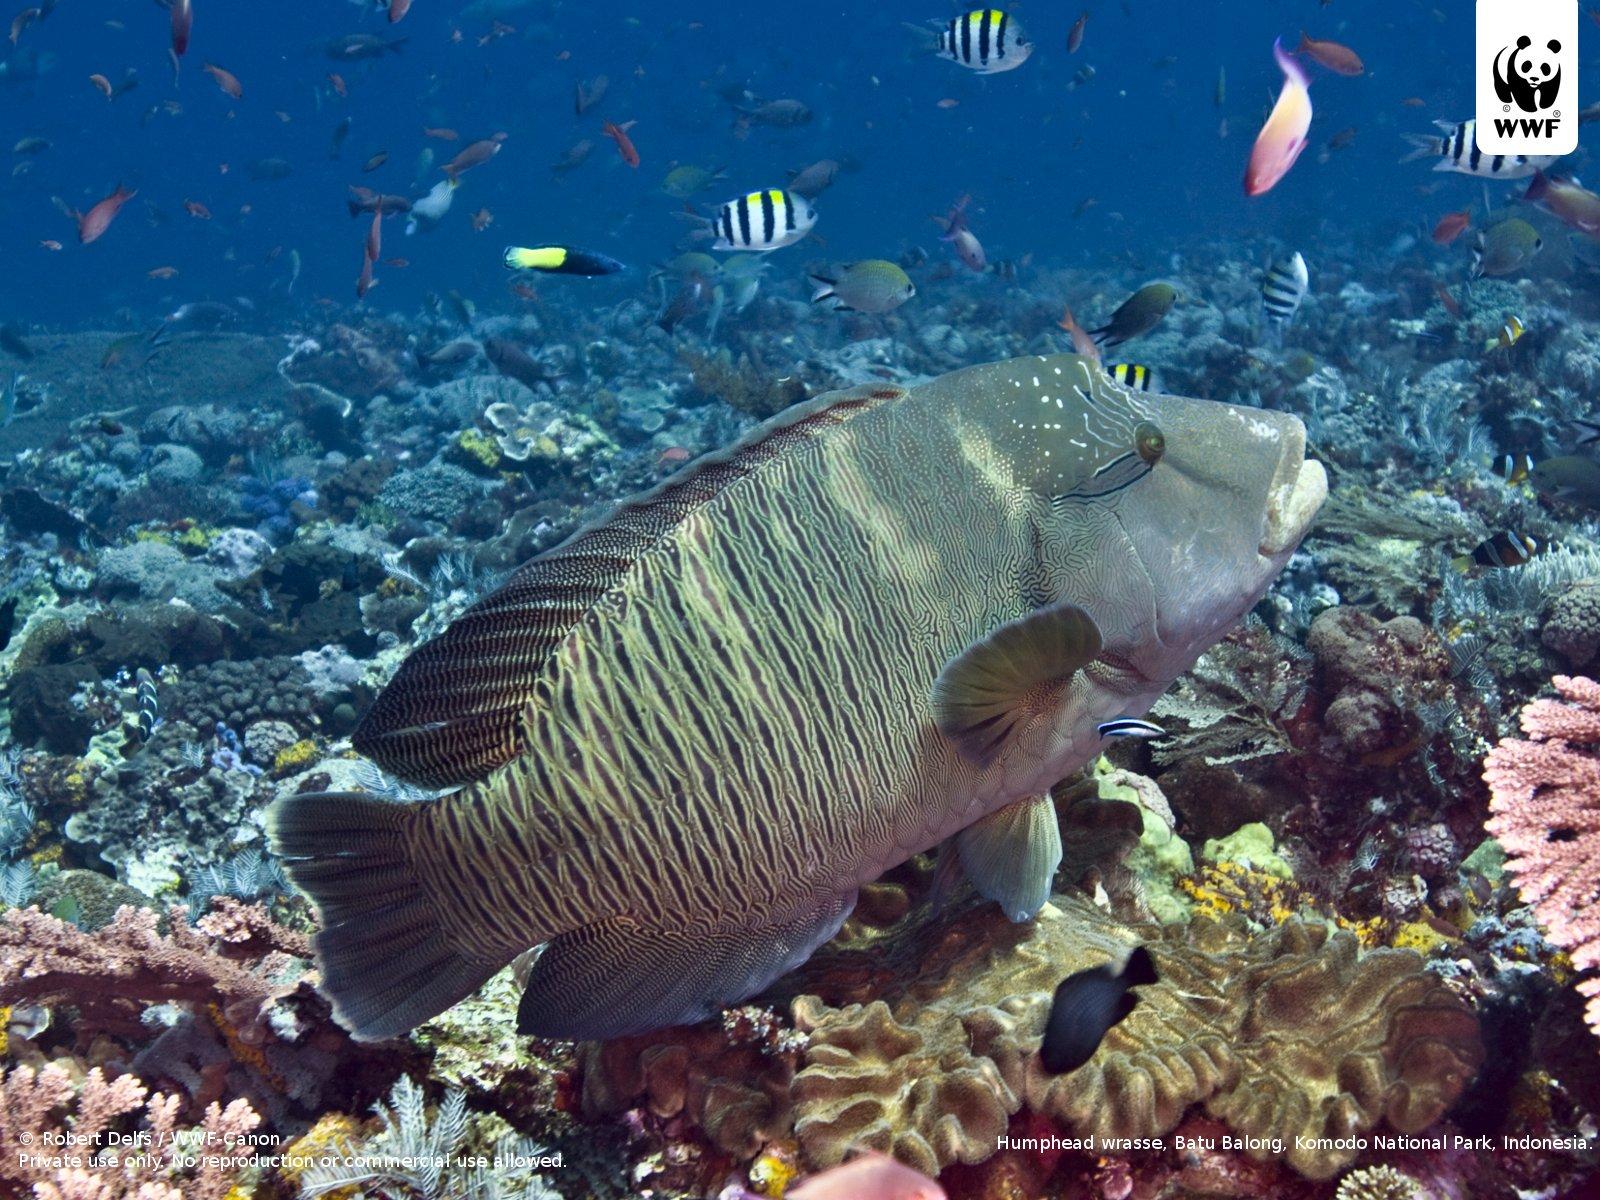 Large numbers of threatened reef fish still traded | WWF | 1600 x 1200 jpeg 424kB